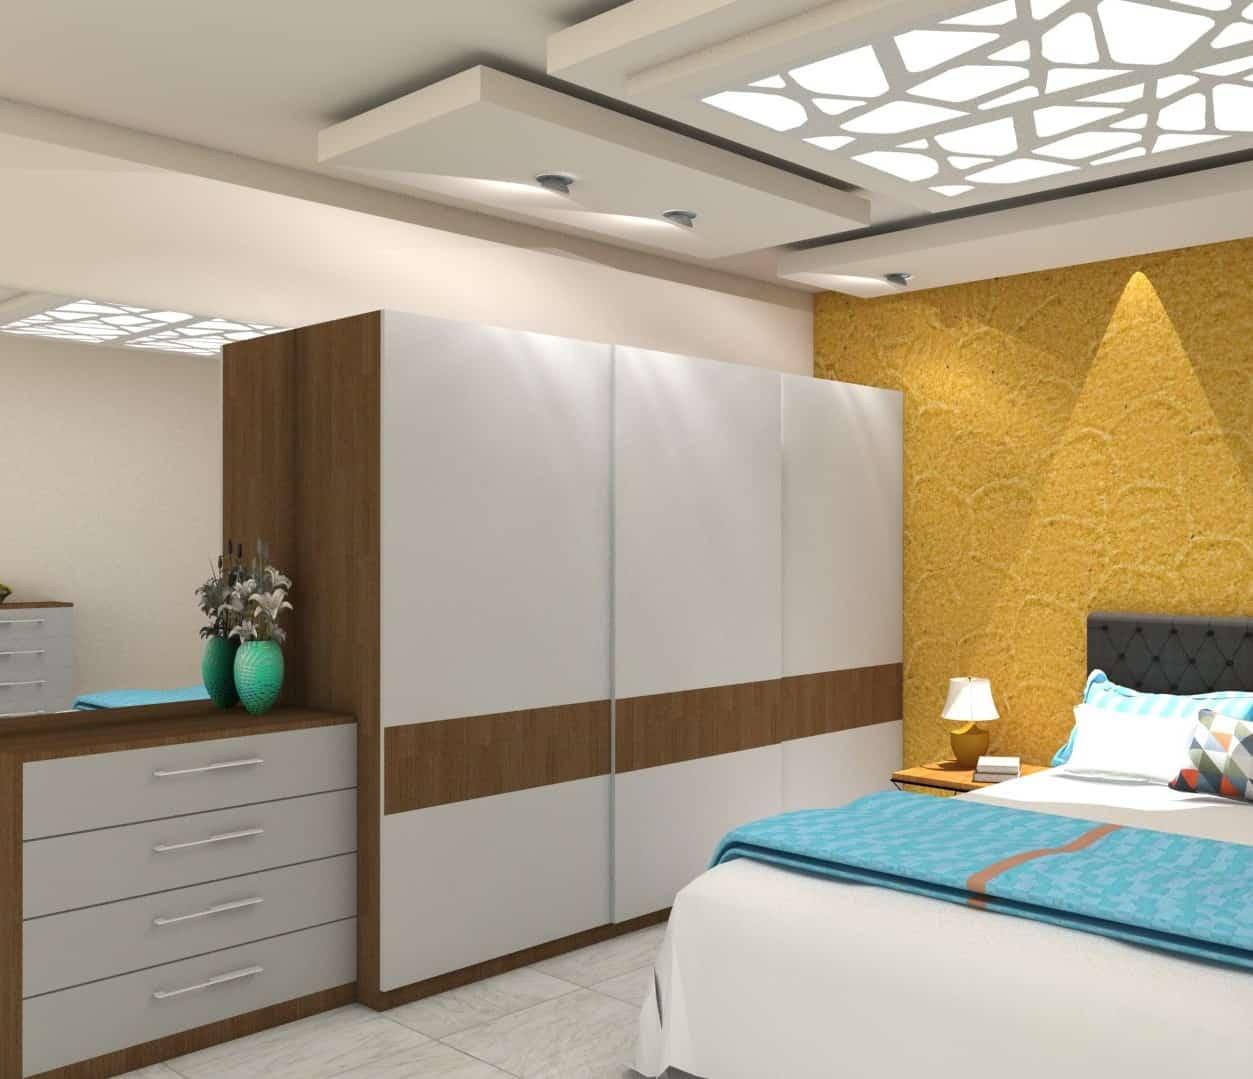 Wardrobe Interior Design and Bedroom Decor